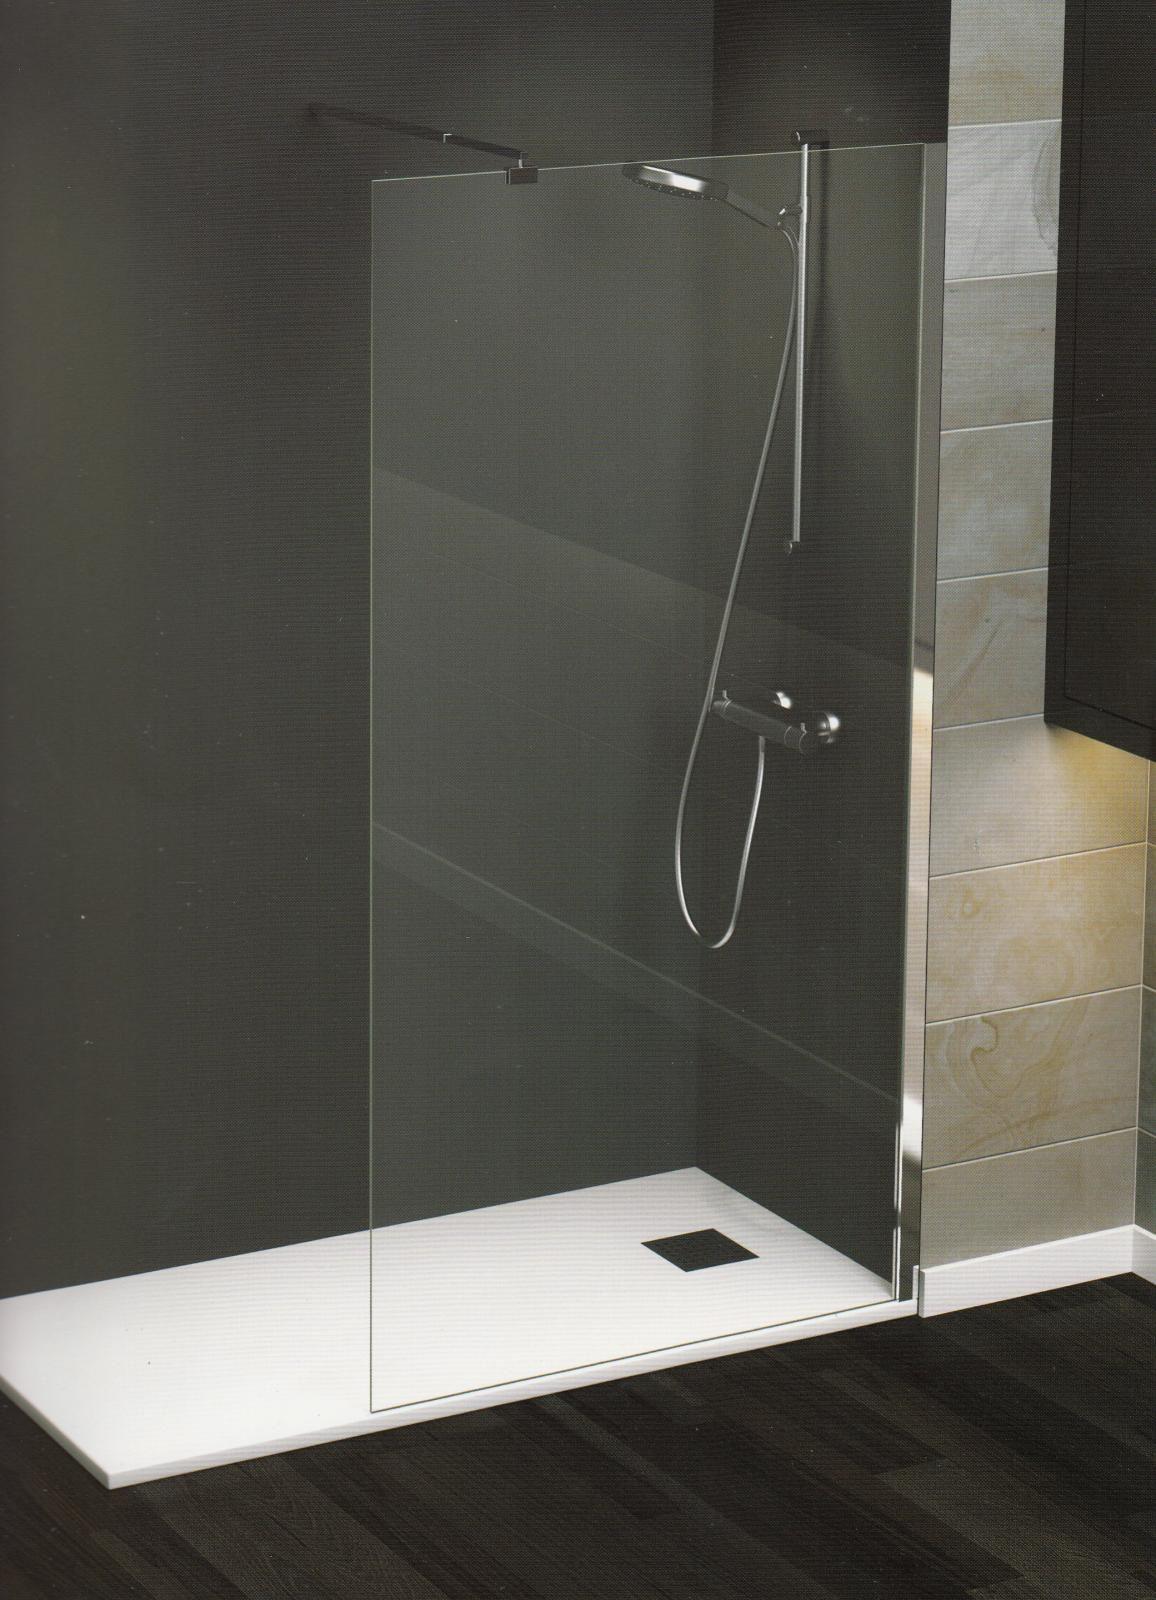 panel fijo para ducha reversible fabricacin estandar perfil a pared en cromo inox